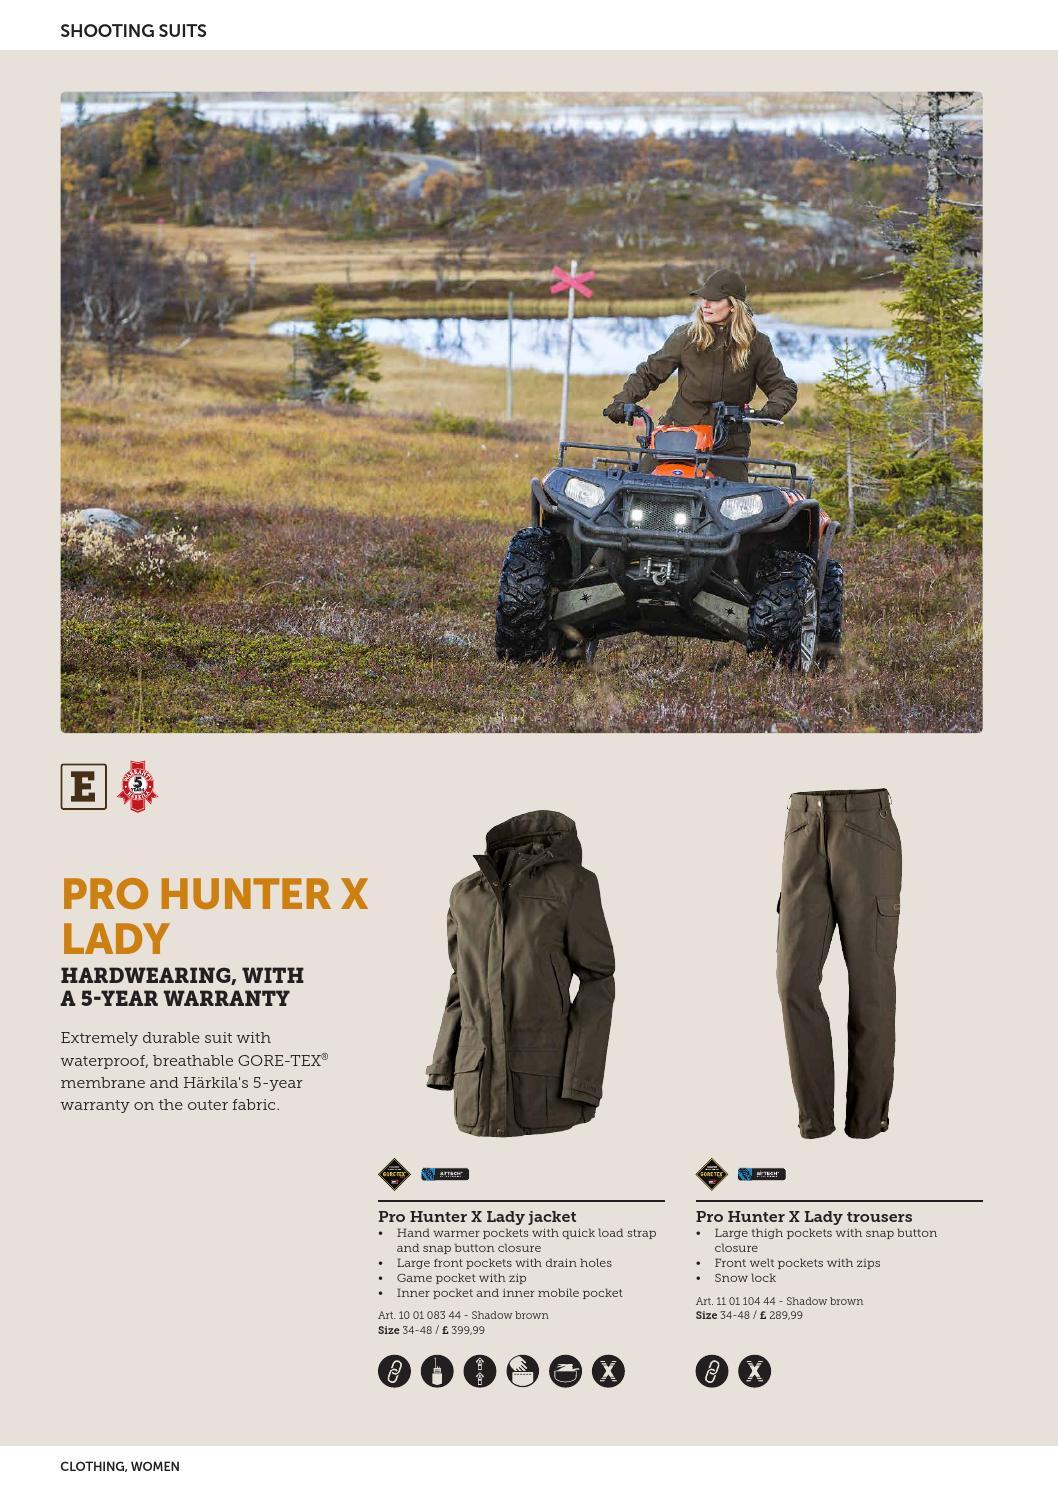 Pro Hunter X Lady Trouser